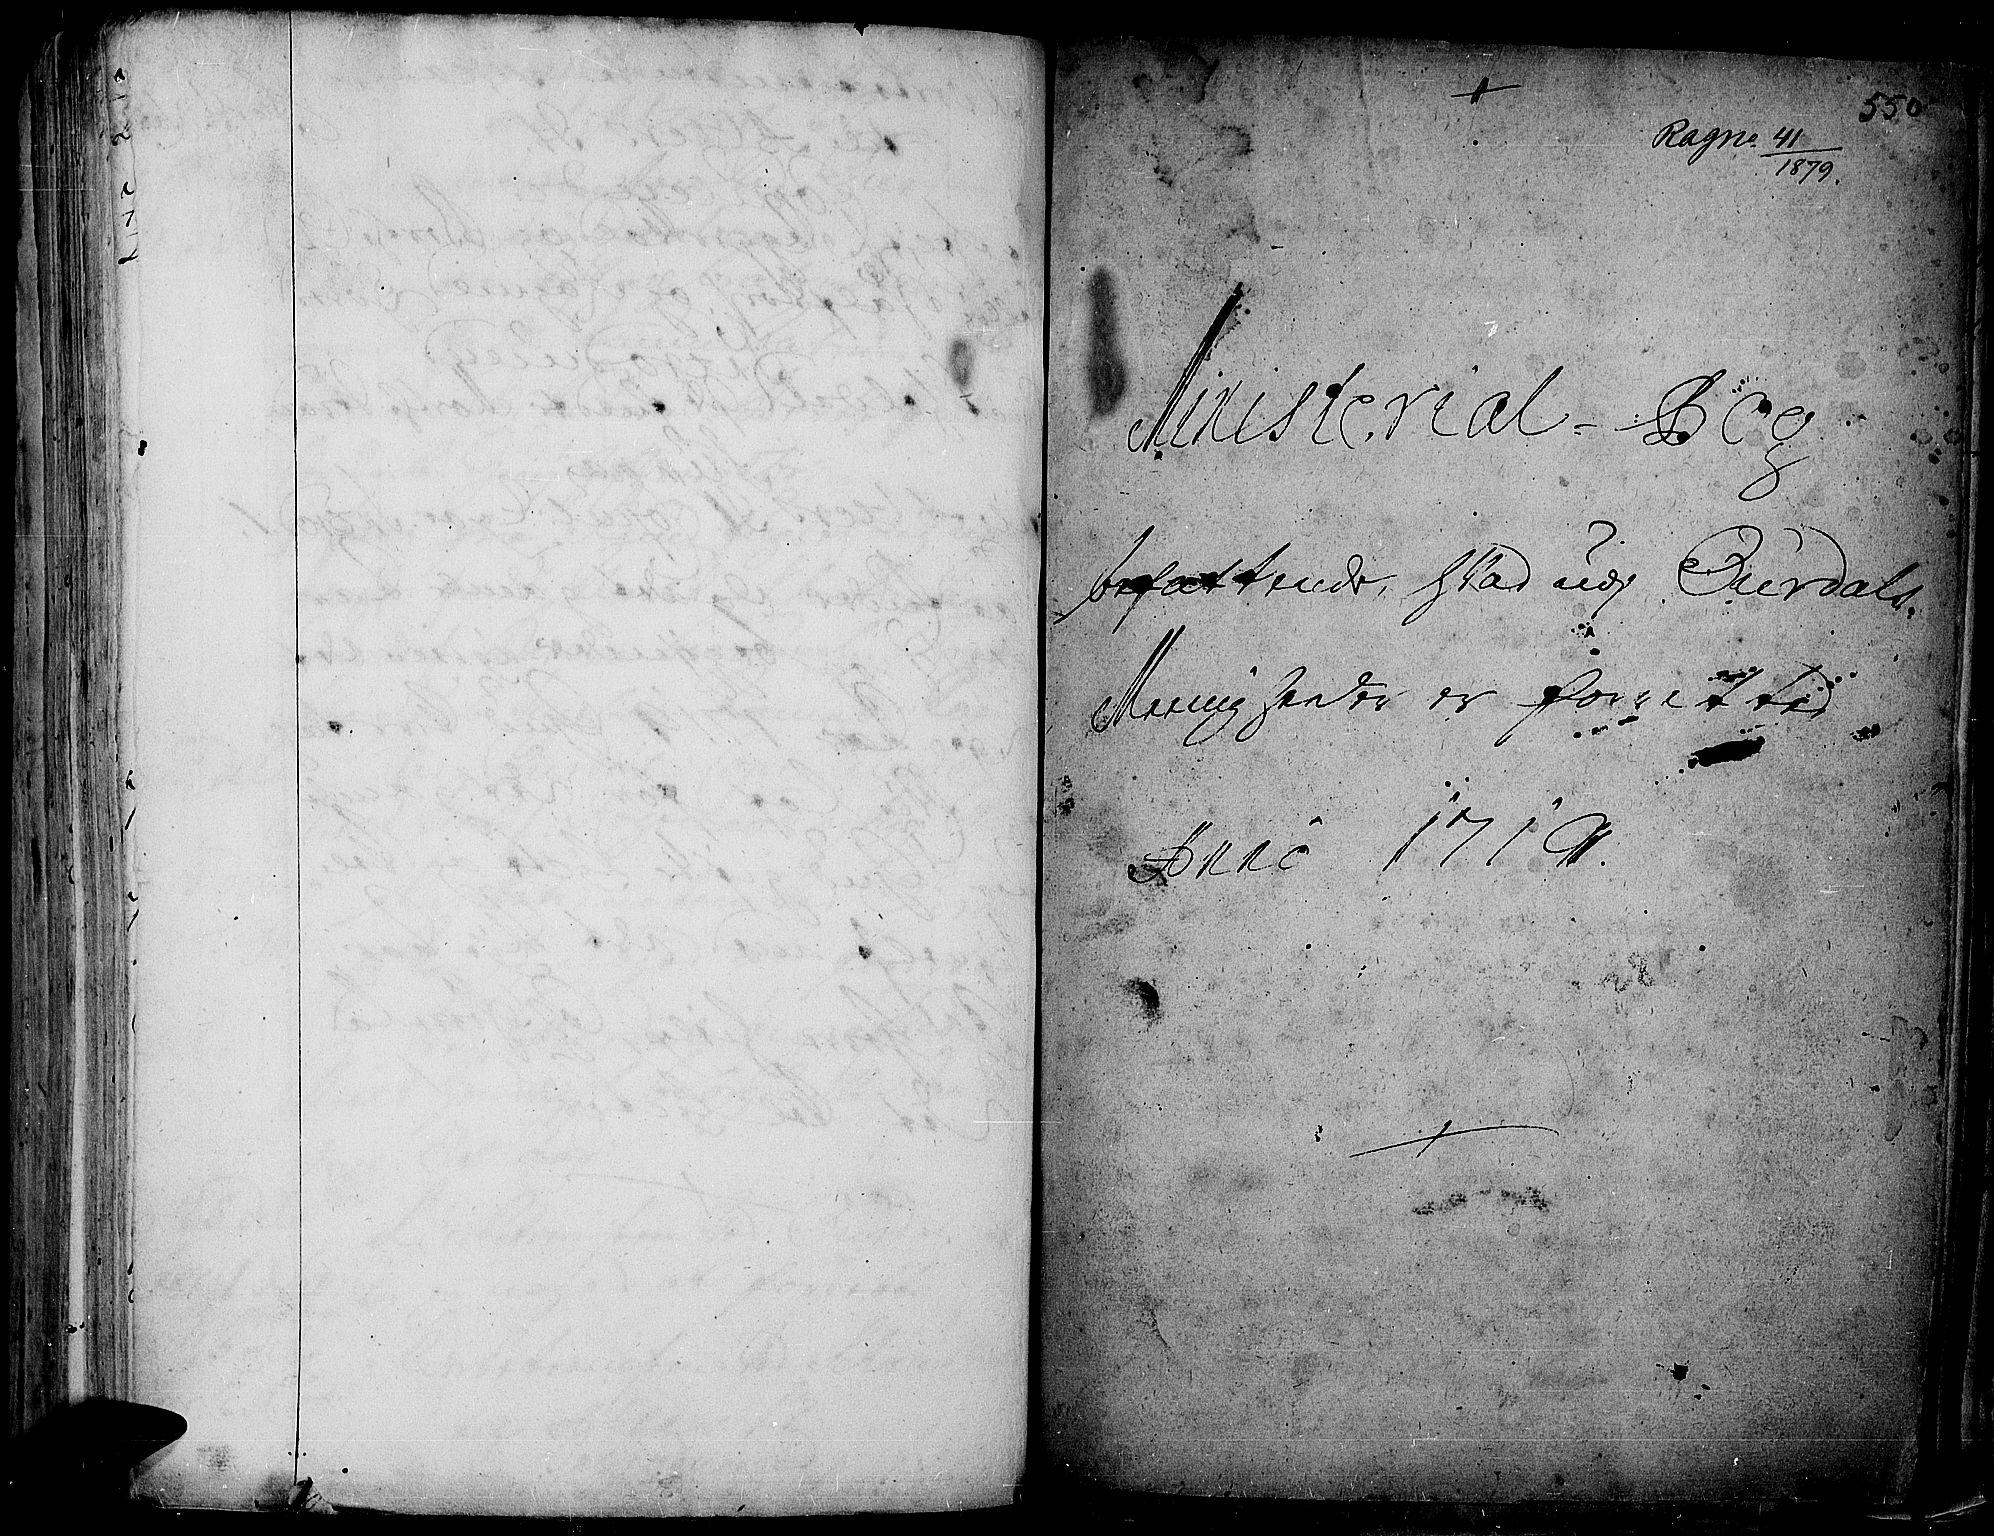 SAH, Aurdal prestekontor, Ministerialbok nr. 1-3, 1692-1730, s. 550